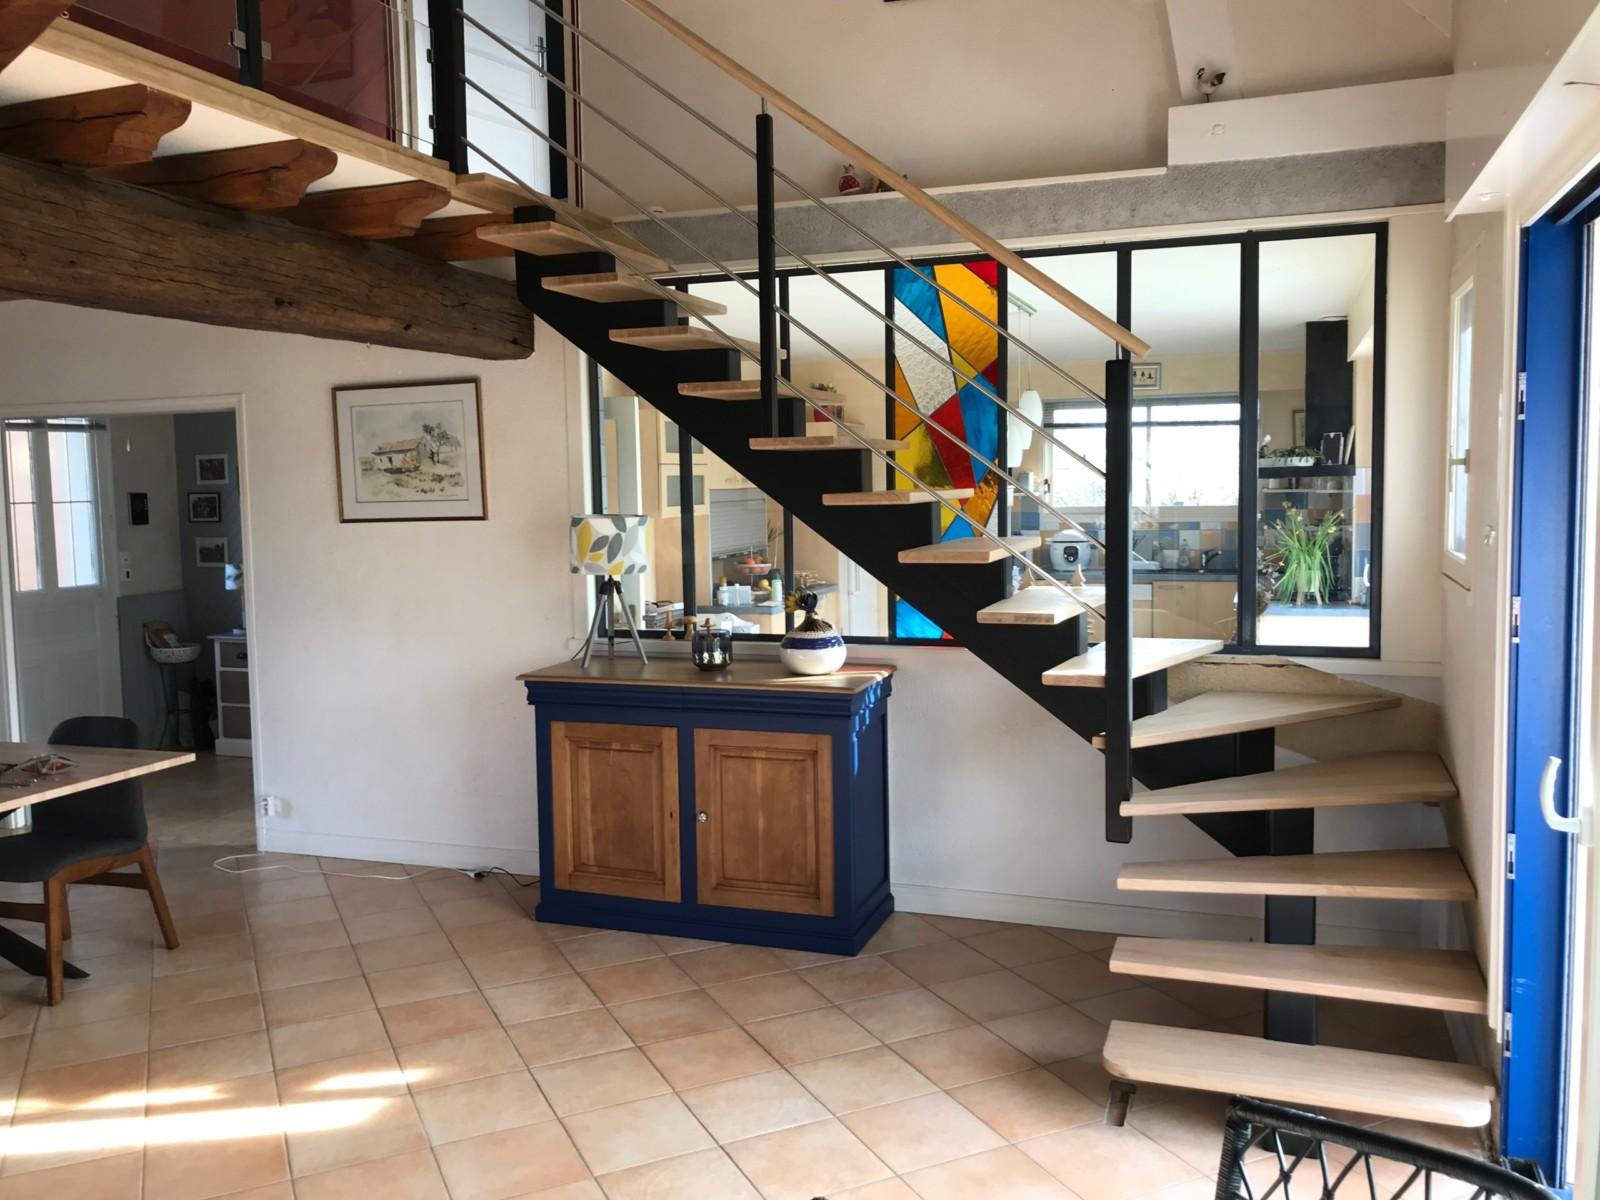 REGIS BERTHELOT Fabricant Escaliers Longue Jumelles IMG 0987